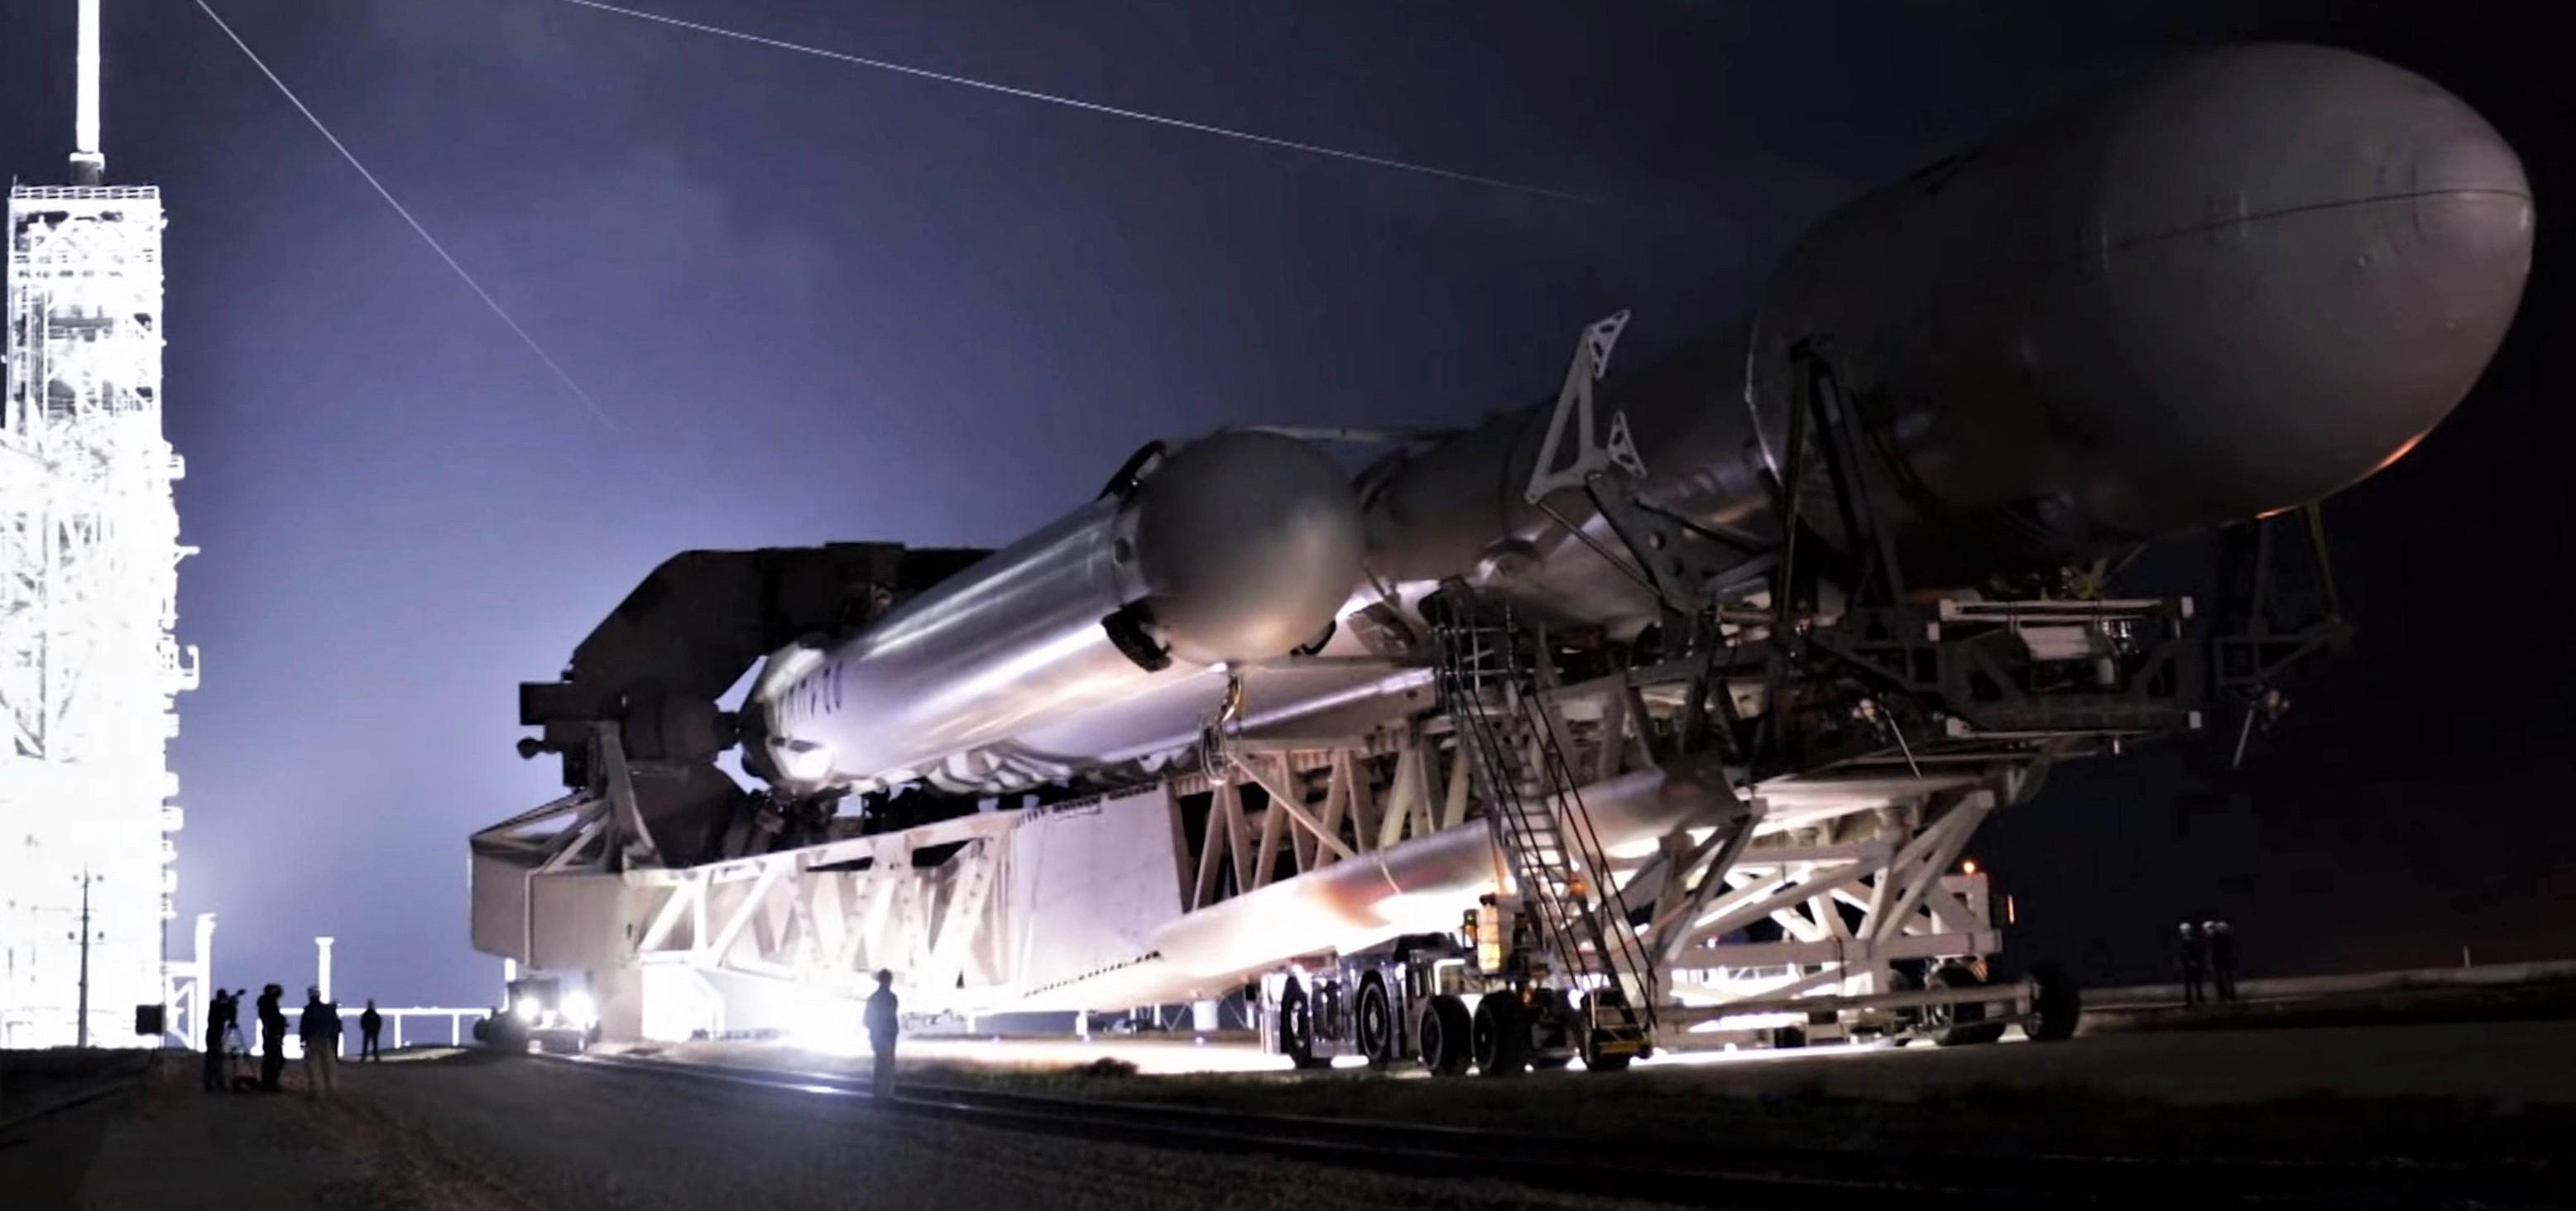 Falcon Heavy Flight 1 rollout (SpaceX) pano 1 edit